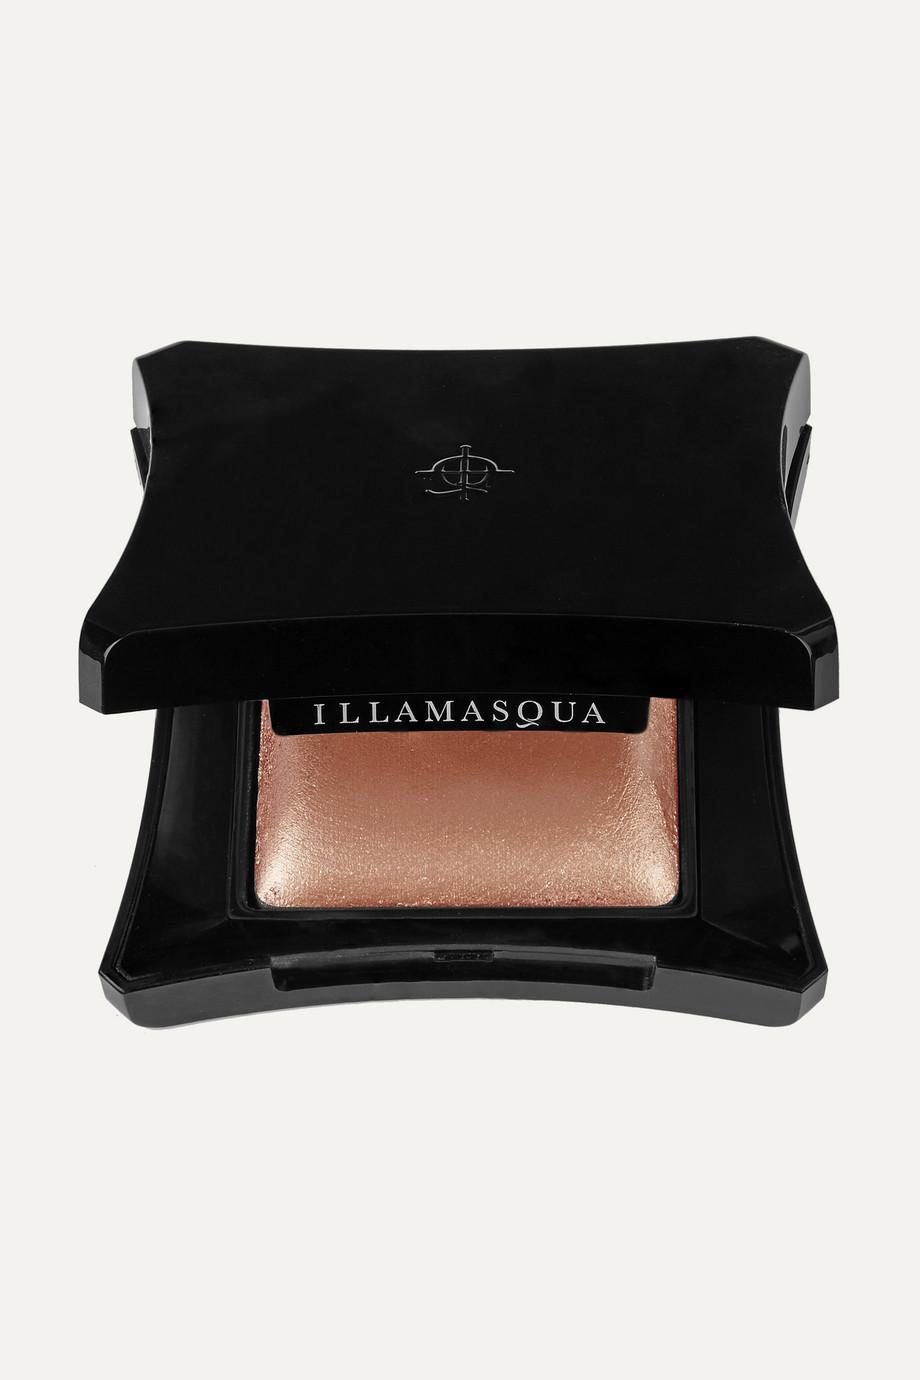 Illamasqua Beyond Powder – Epic – Highlighter